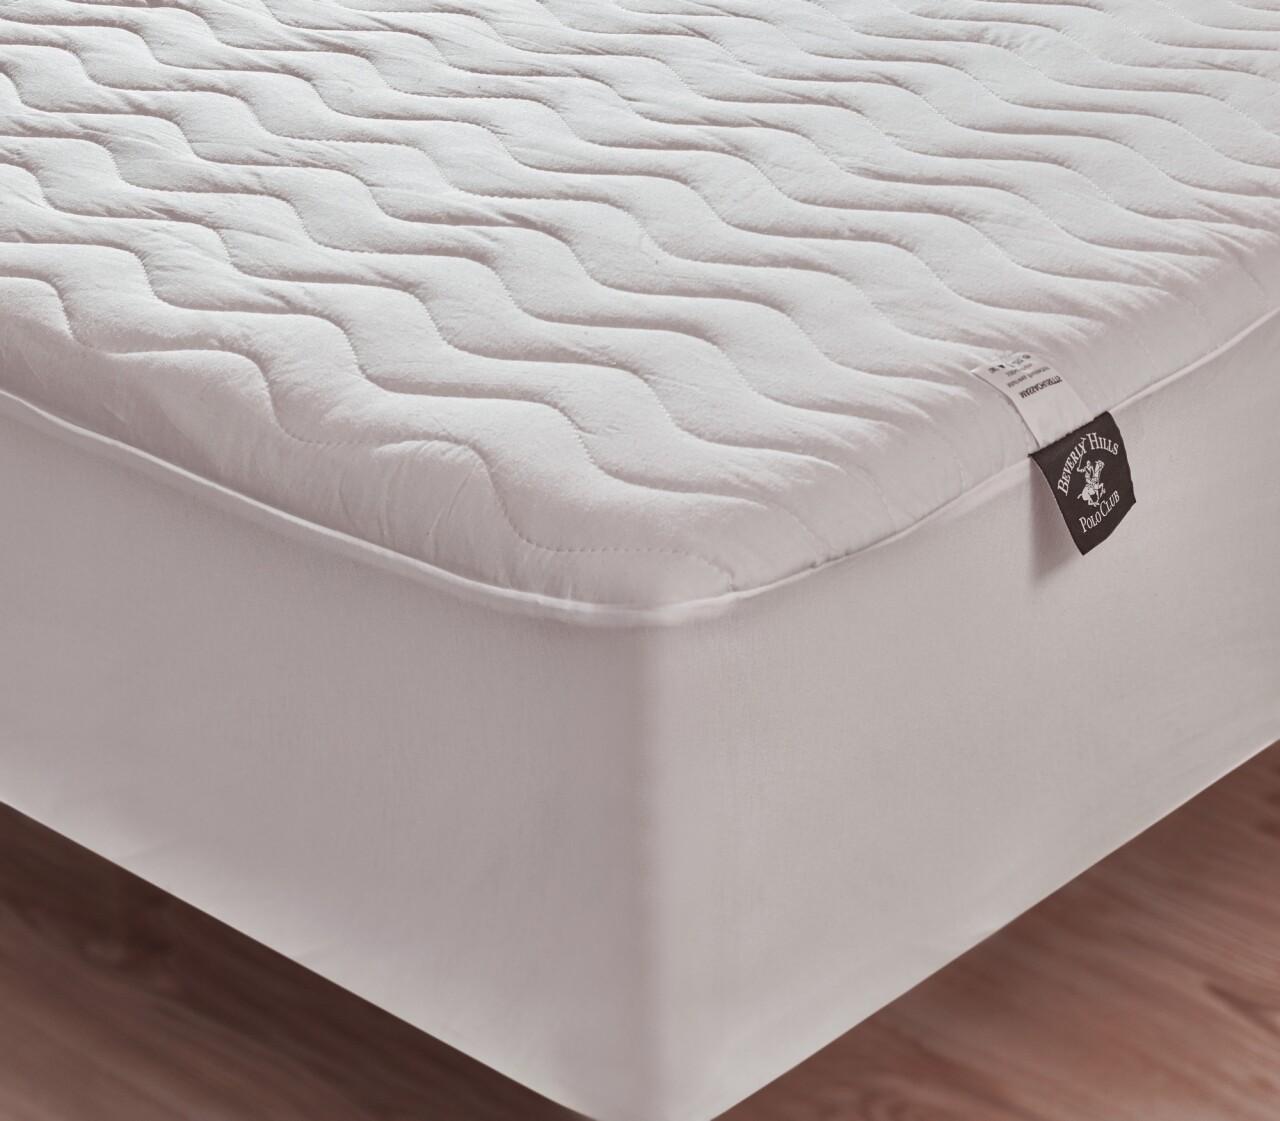 Husa protectie de pat pentru o persoana, 100x200 cm, 100% bumbac, Beverly Hills Polo Club, White